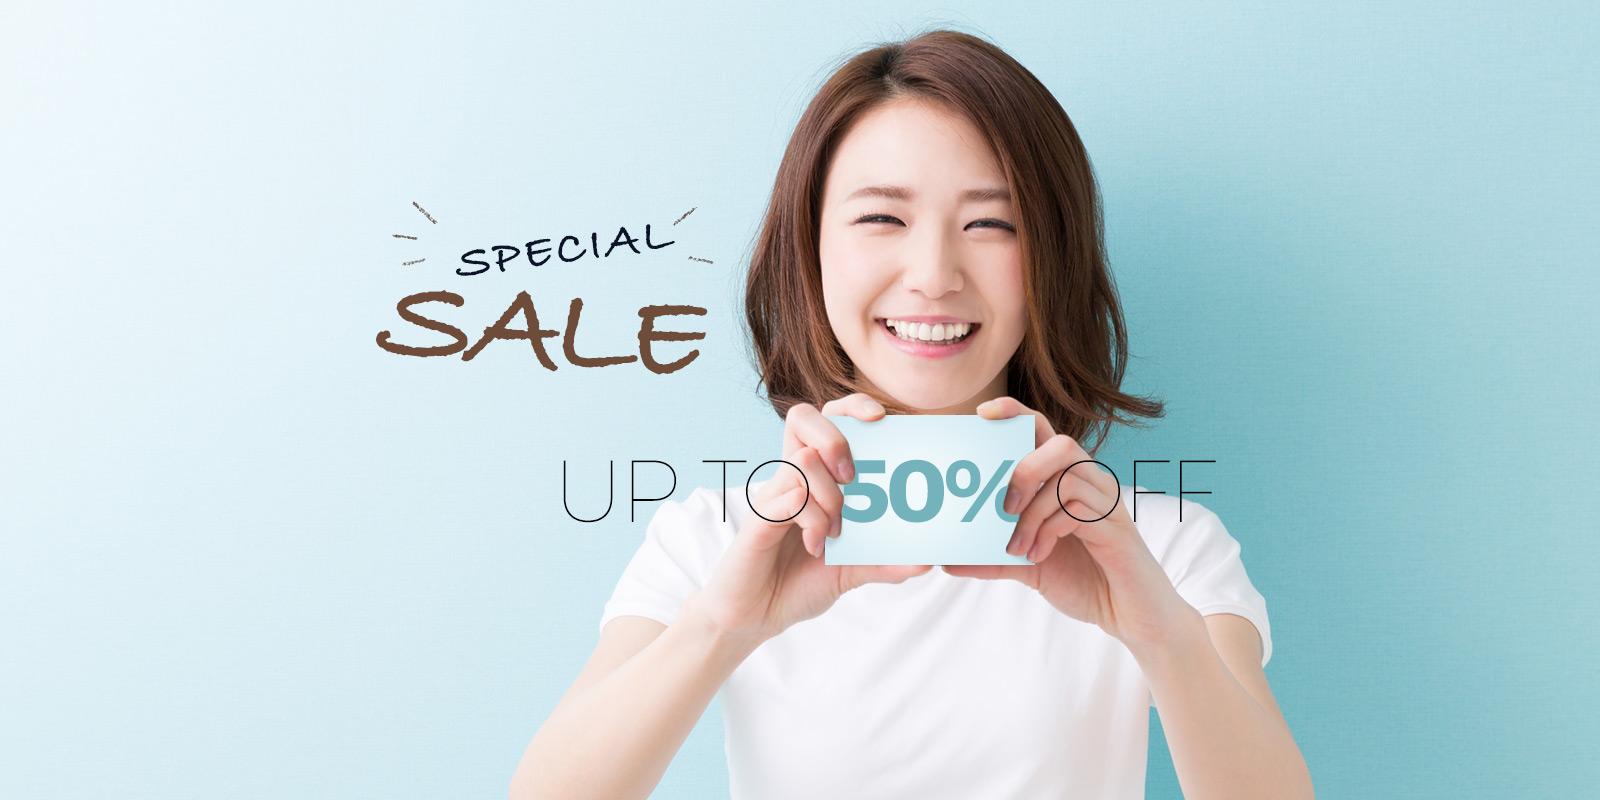 special-sale-header-image